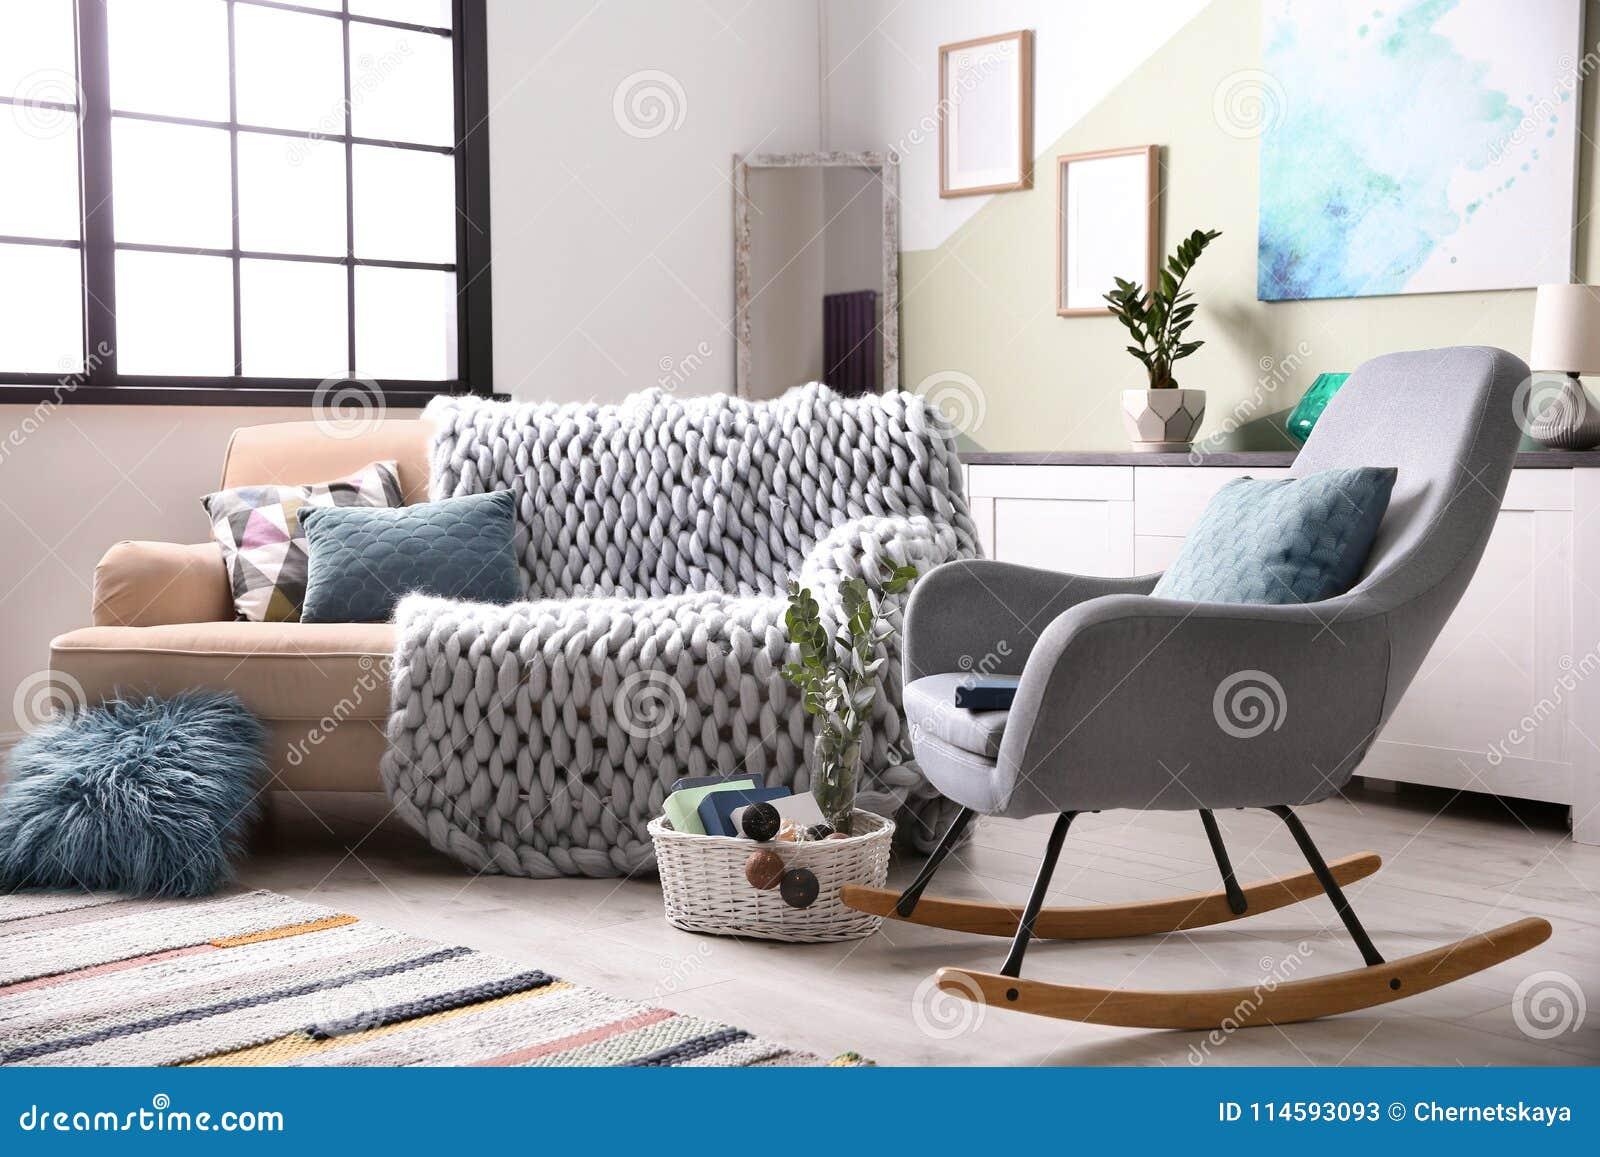 Stylish Living Room Interior With Comfortable Sofa Stock Image